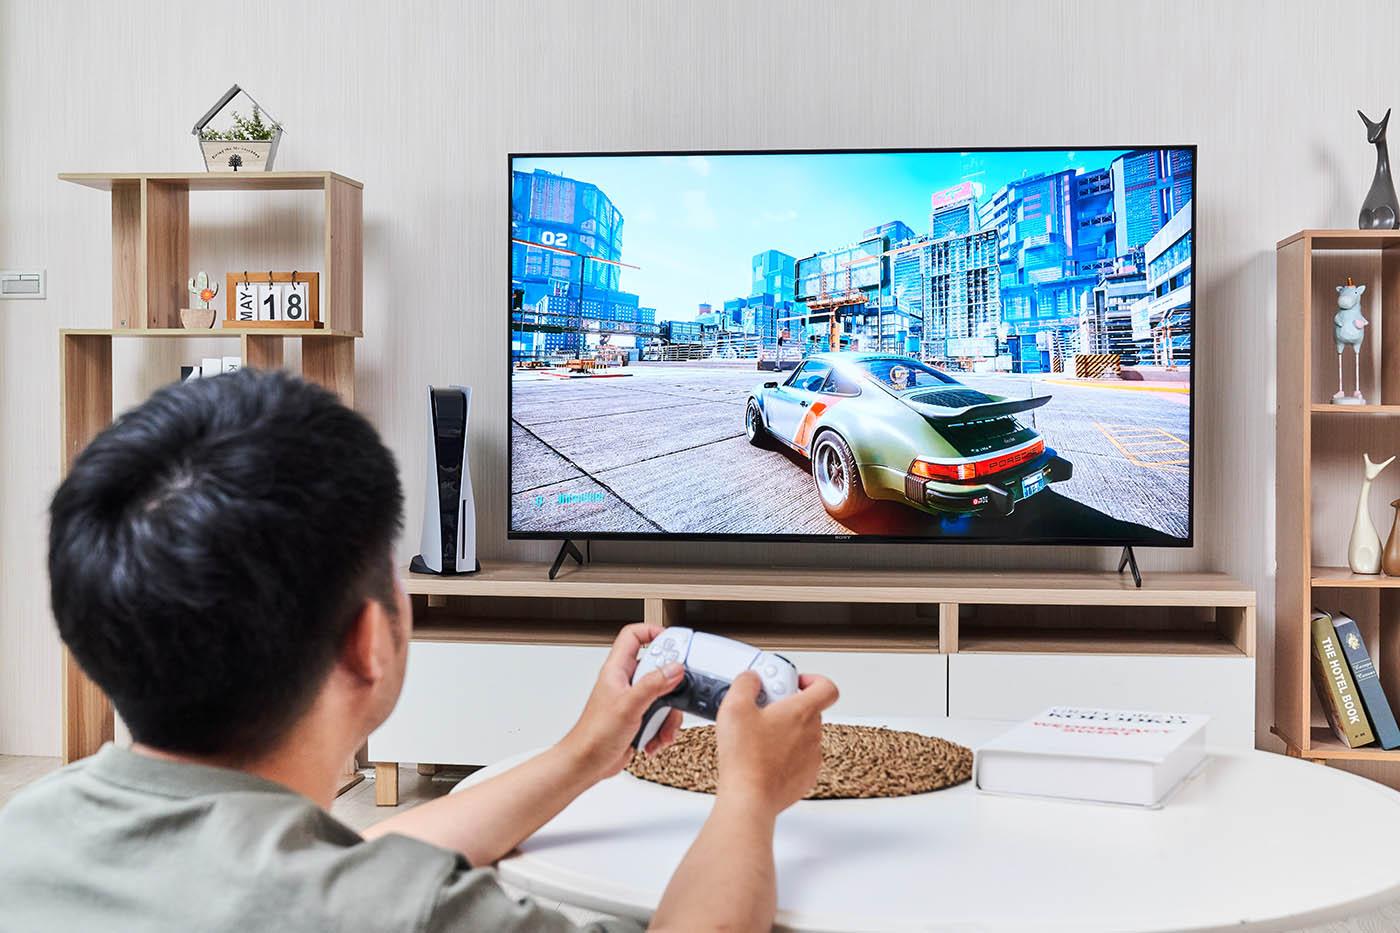 XRM-65X90J 擁有最適合玩遊戲的 65 吋大小,更重要的是它支援 HDMI 2.1 規格,能完美�配次世代主機 PS5 及 Xbox Series X 的高要求,讓玩家感受最優質的遊戲操控及聲光體驗。